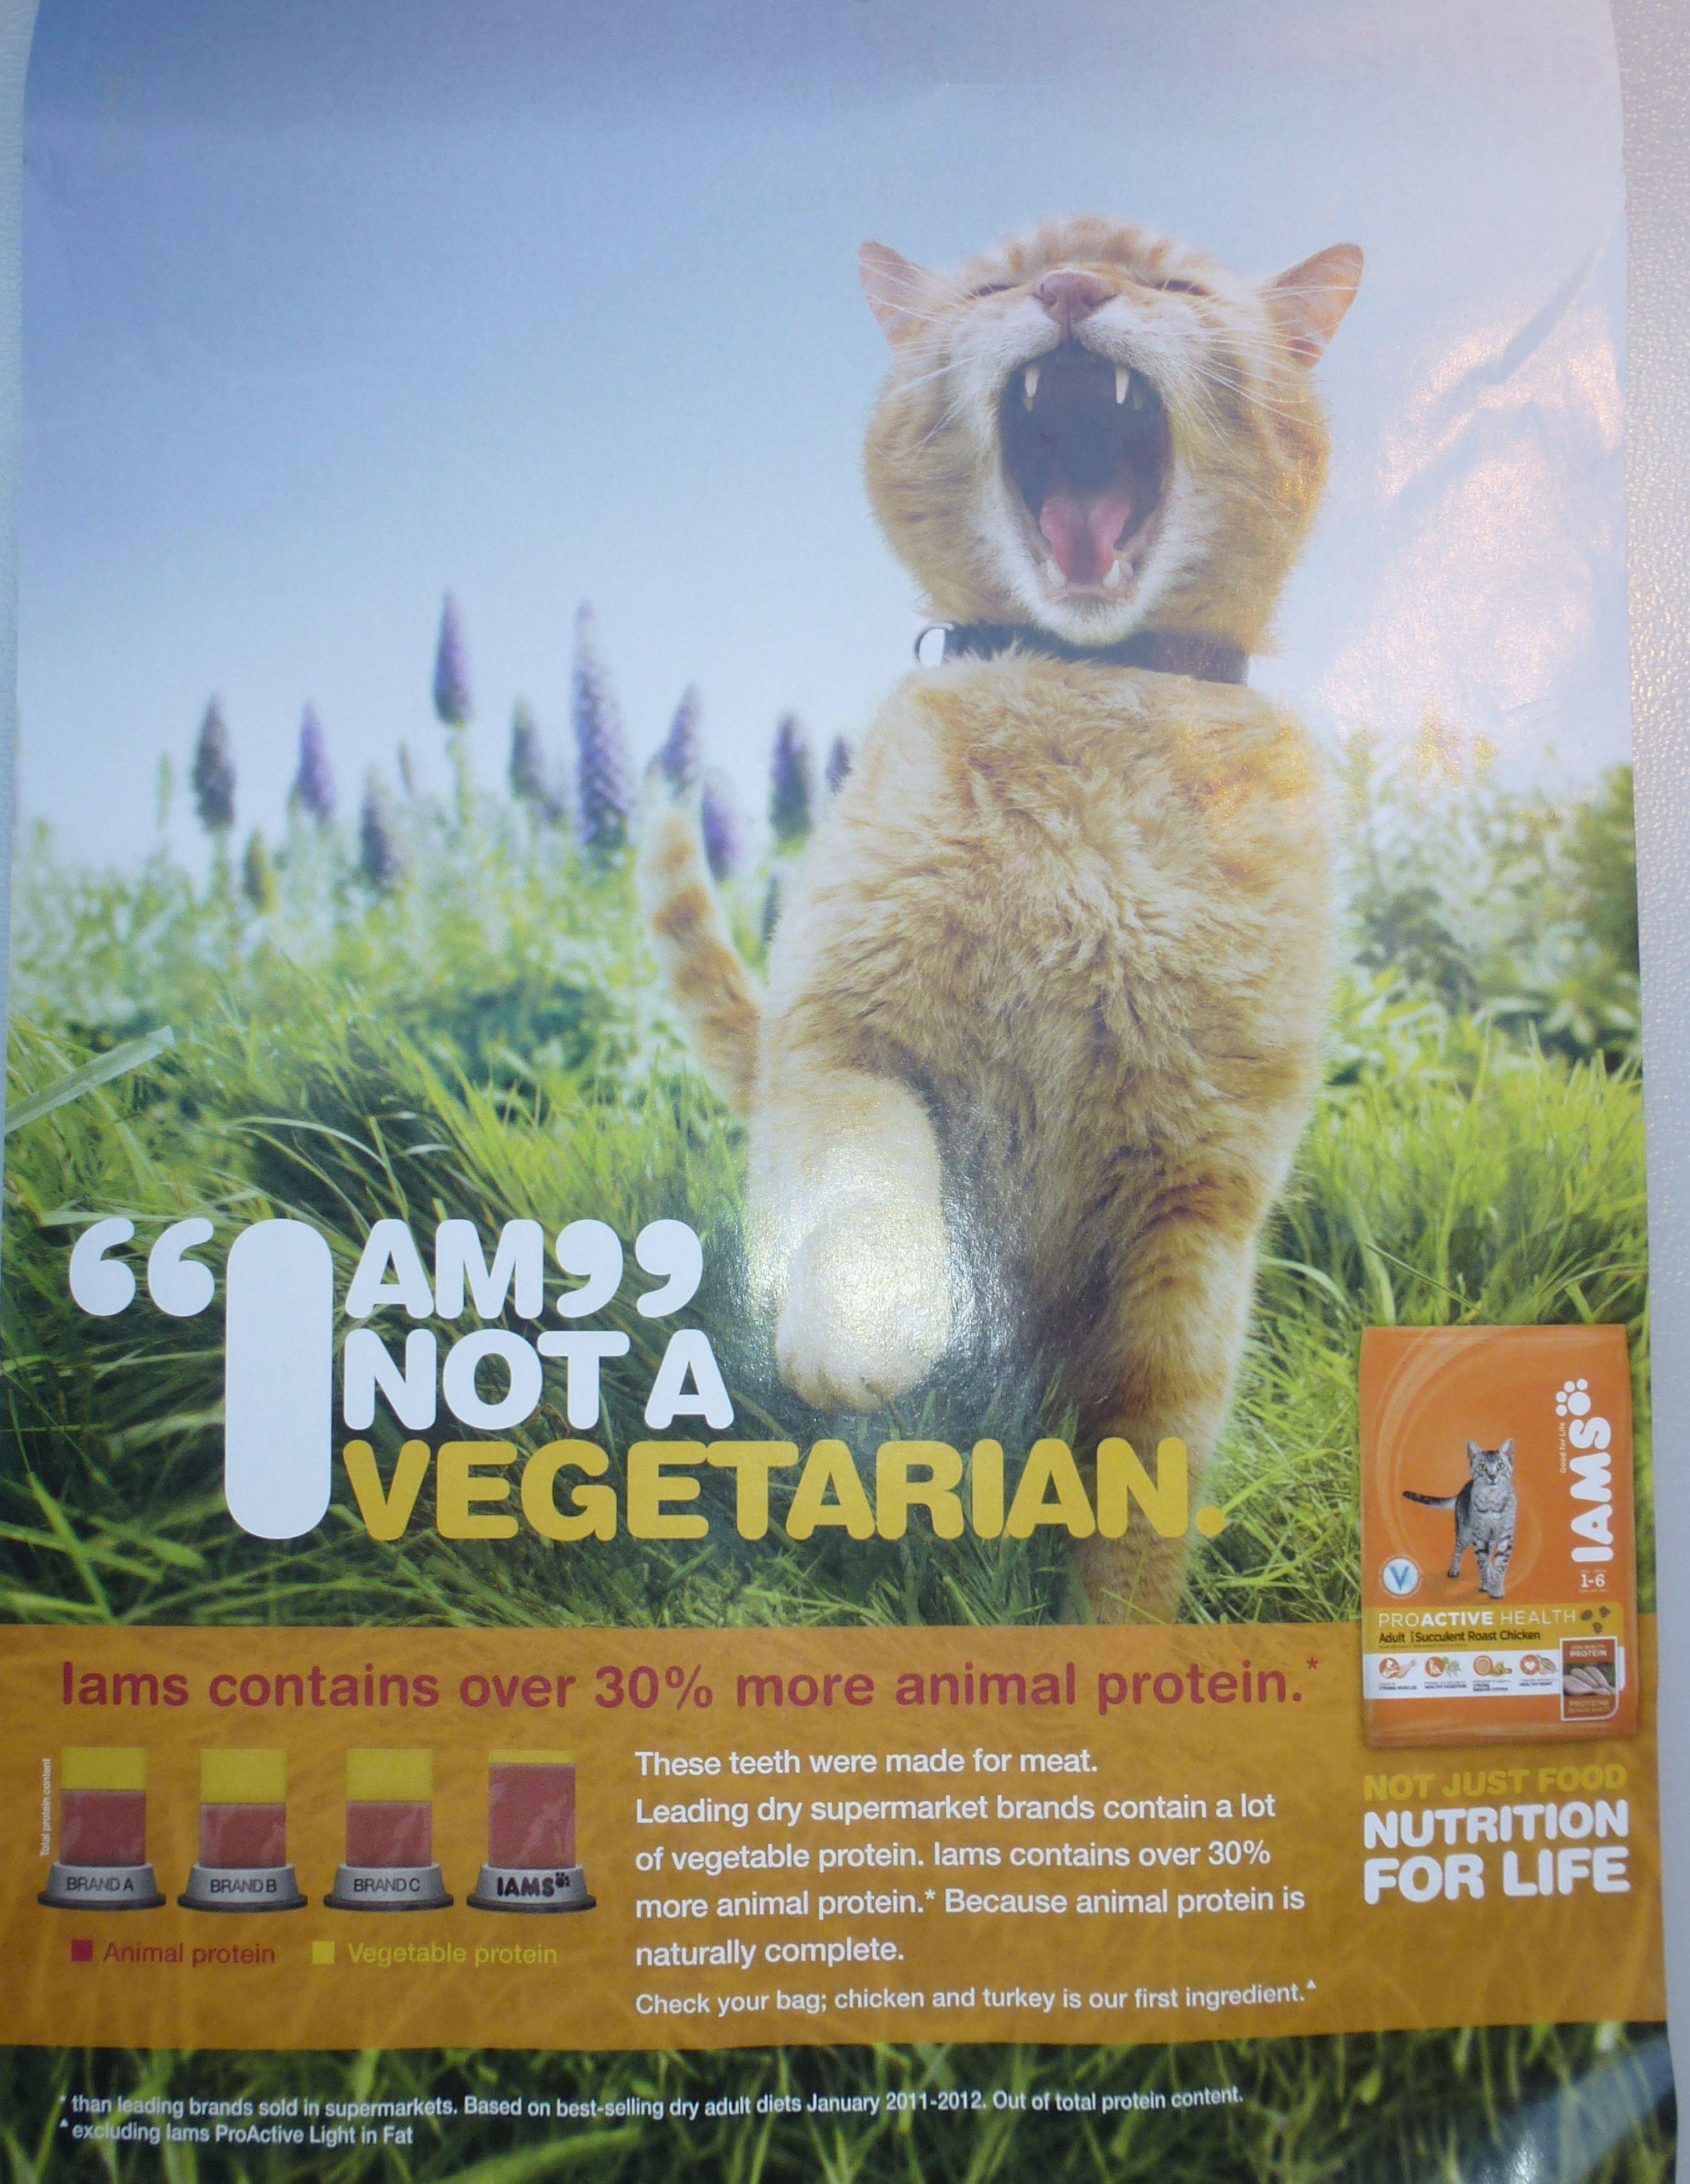 'I am not a vegetarian'. Comparative Brand Statistics